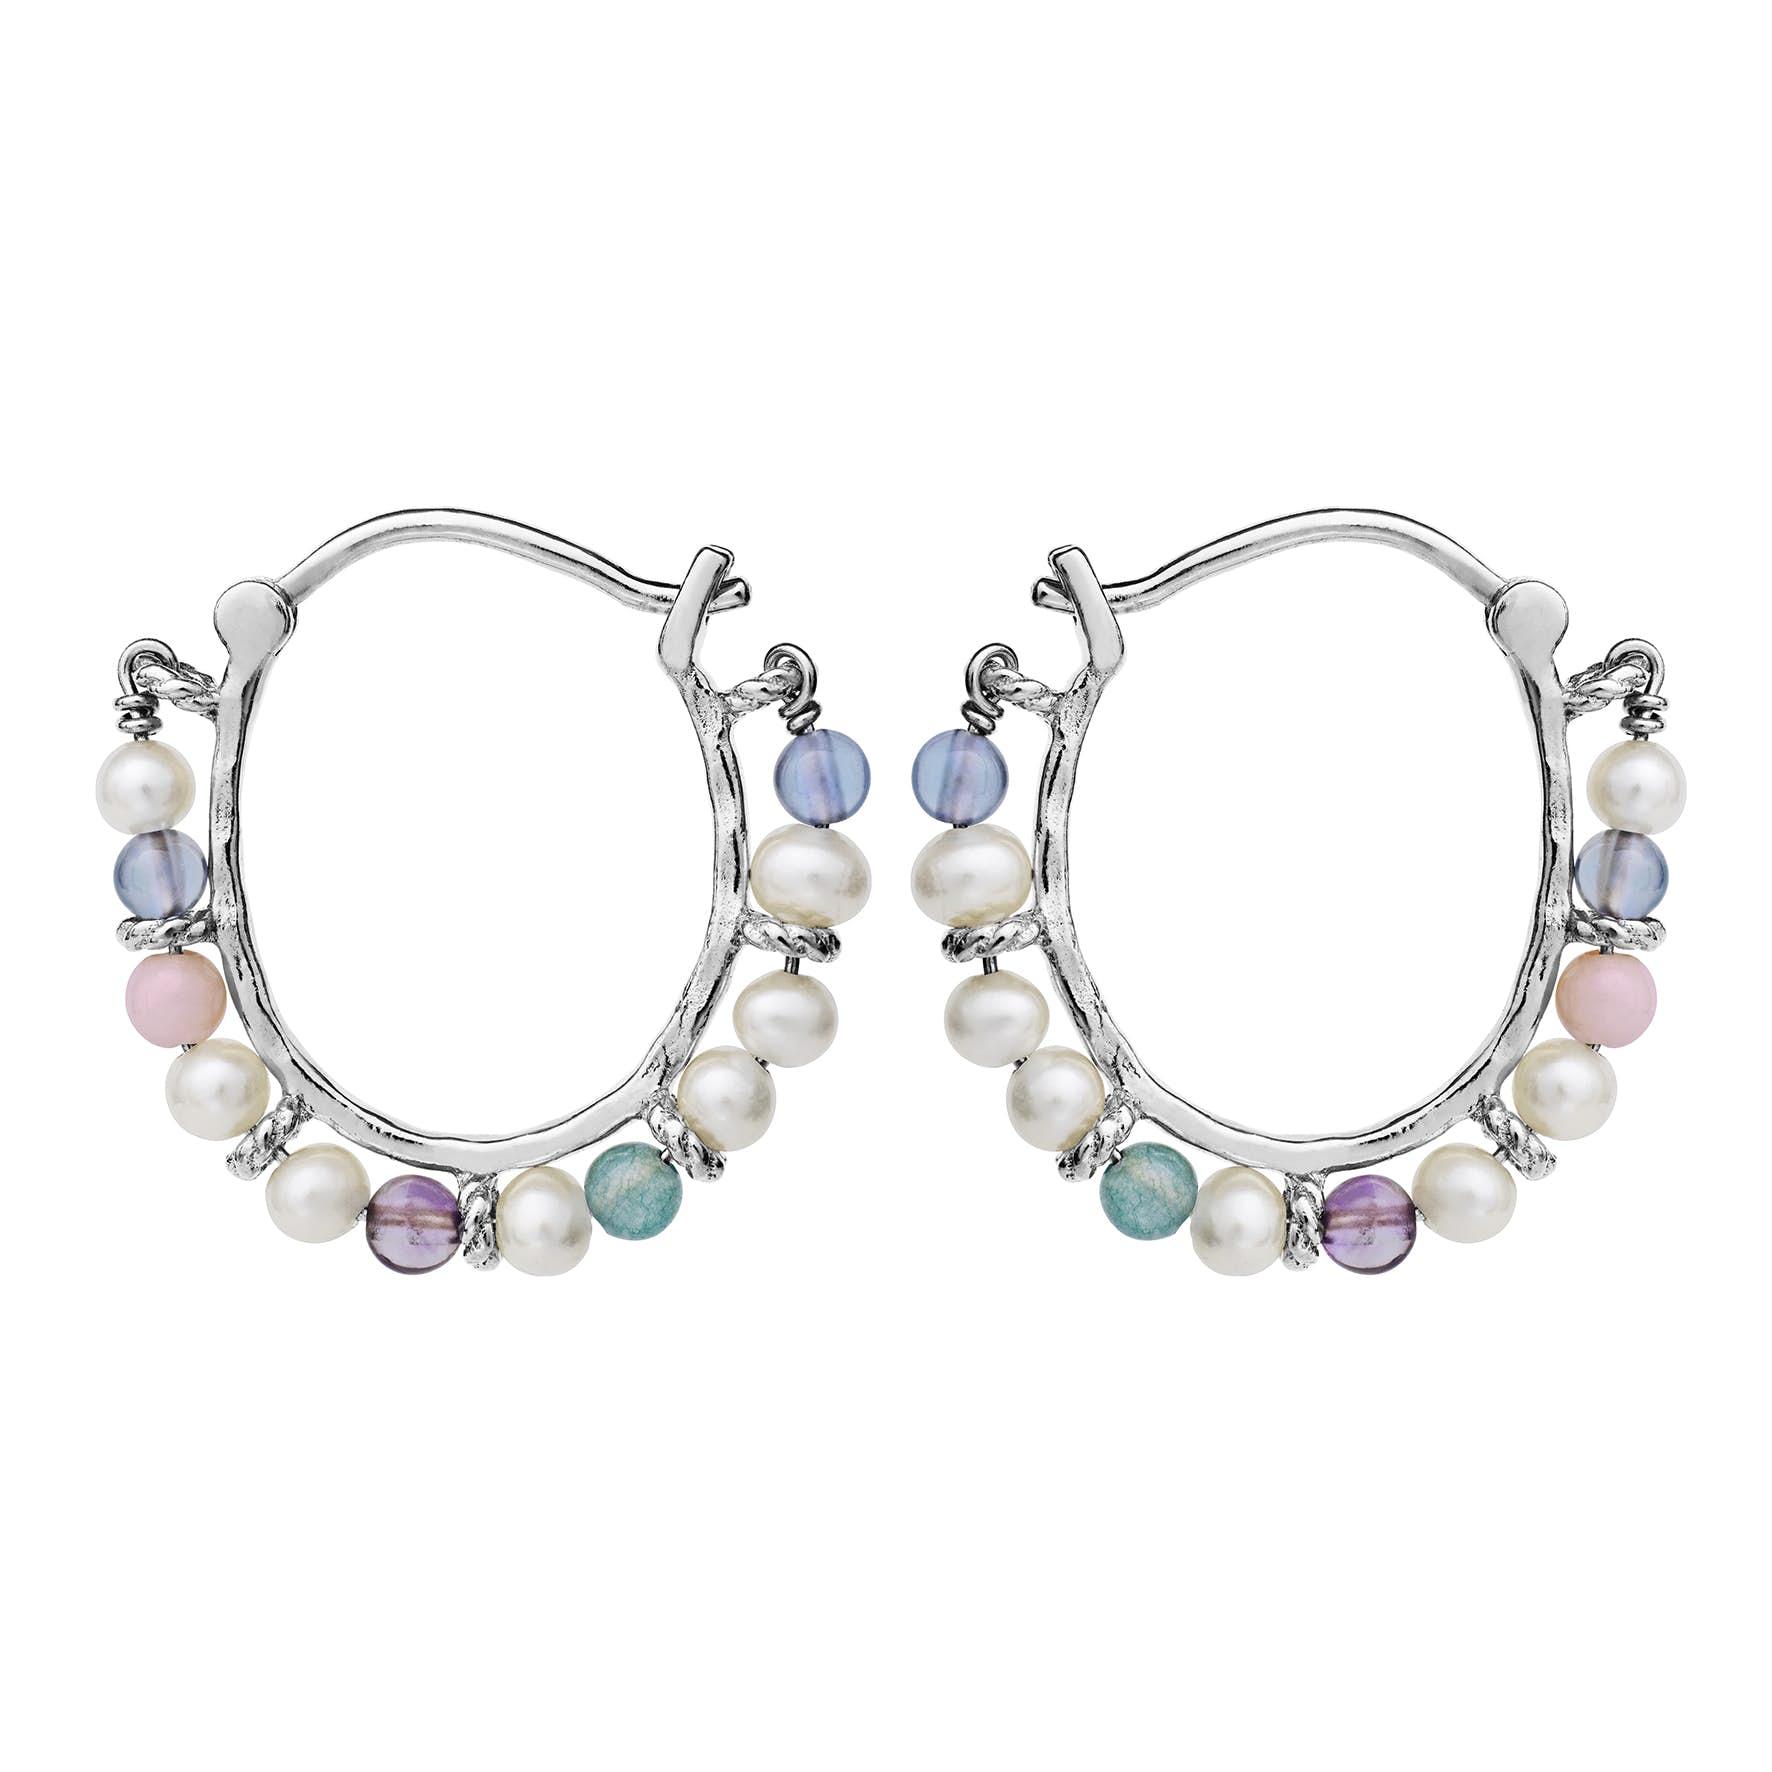 Phile Multi Earrings von Maanesten in Silber Sterling 925